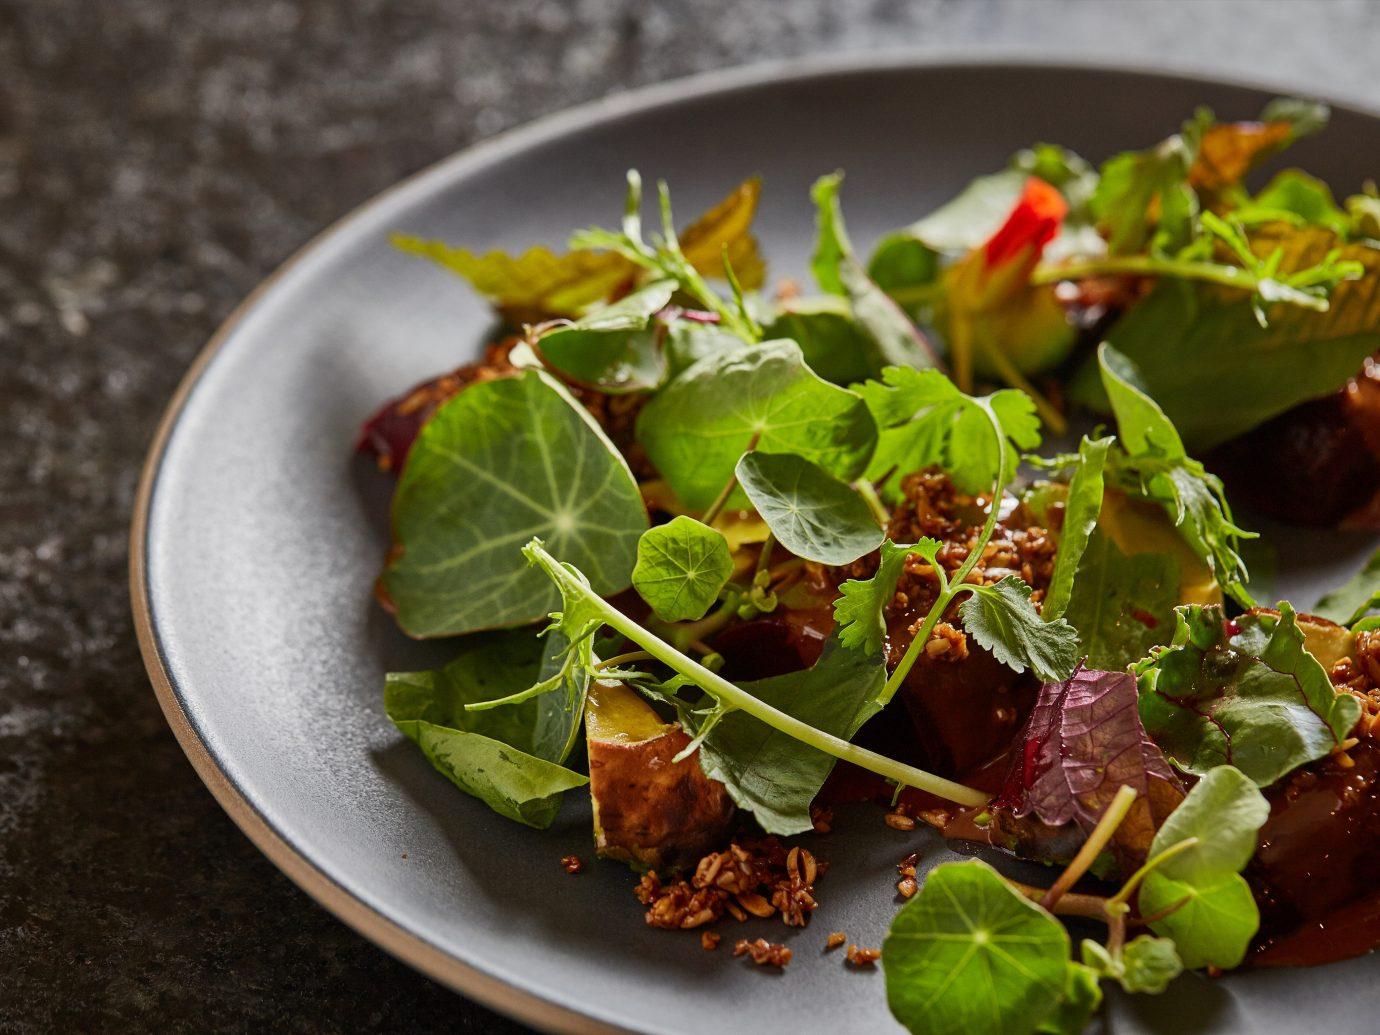 Arts + Culture Food + Drink Hotels Weekend Getaways plate food dish salad produce vegetable slice cuisine leaf vegetable meat flowering plant plant sliced